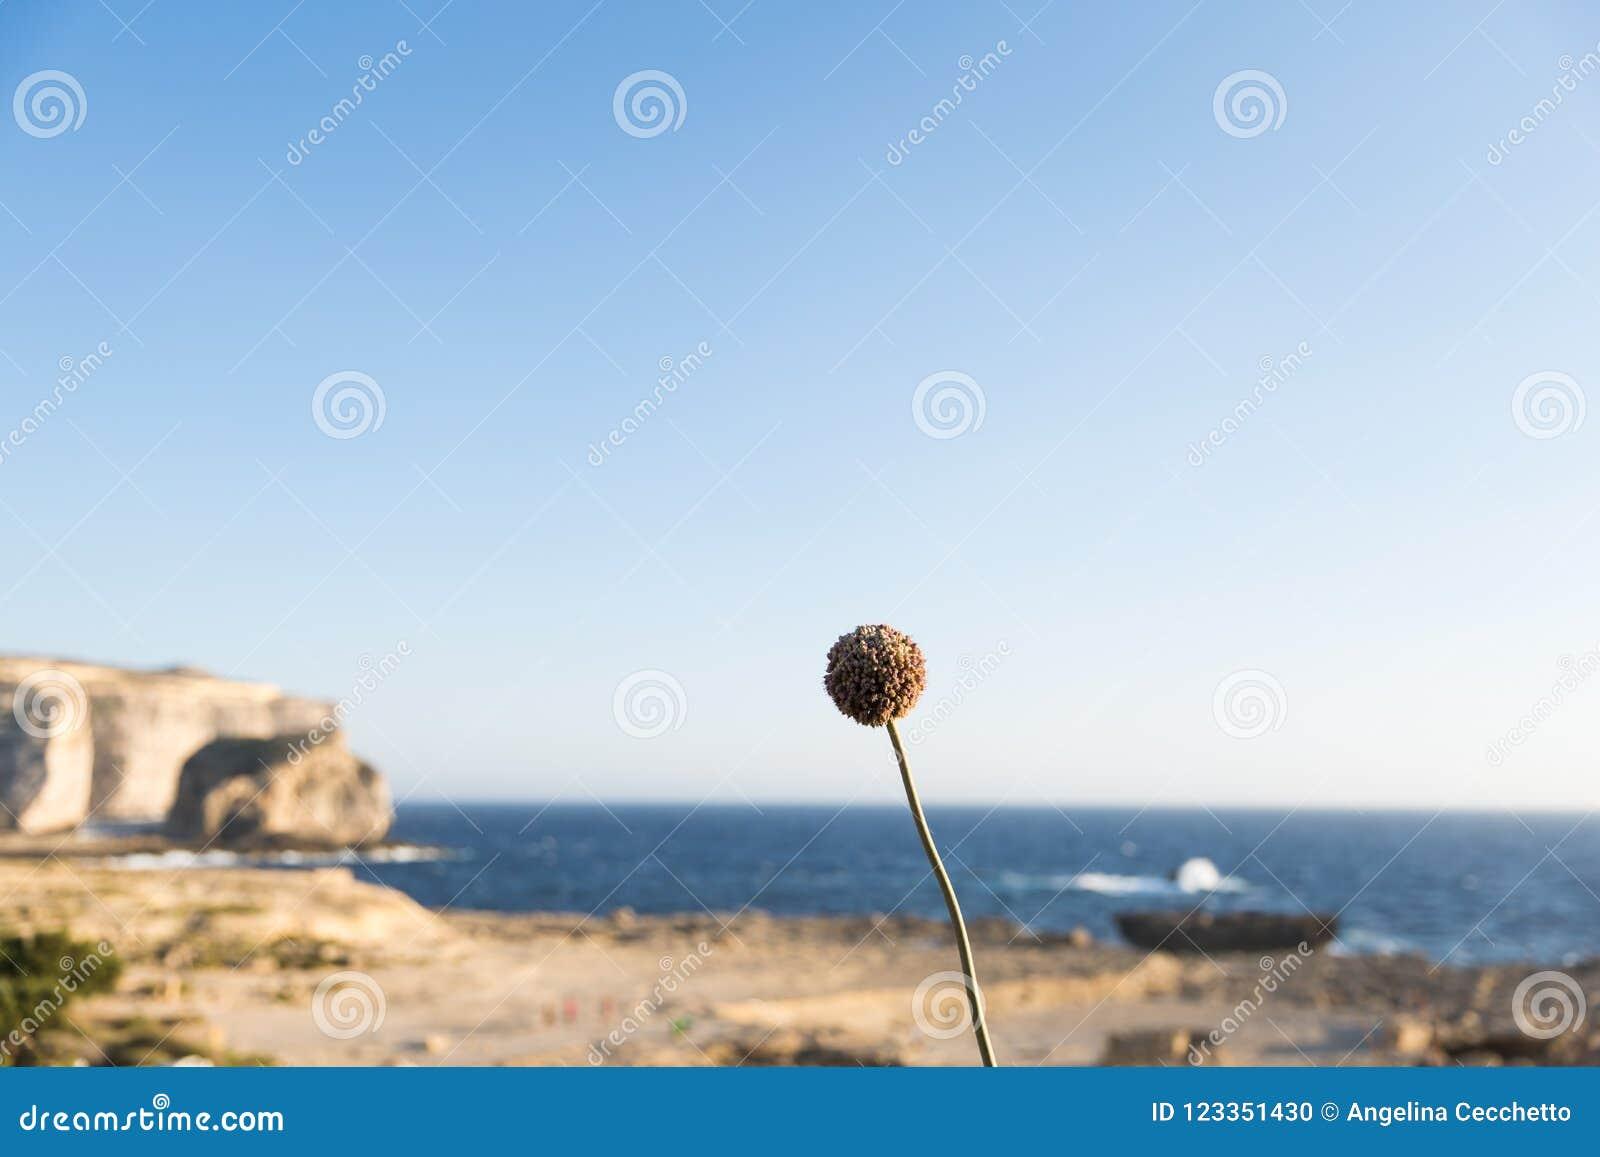 Limestone quarry on the island of Gozo - a photo on Flickriver   Gozo Limestone